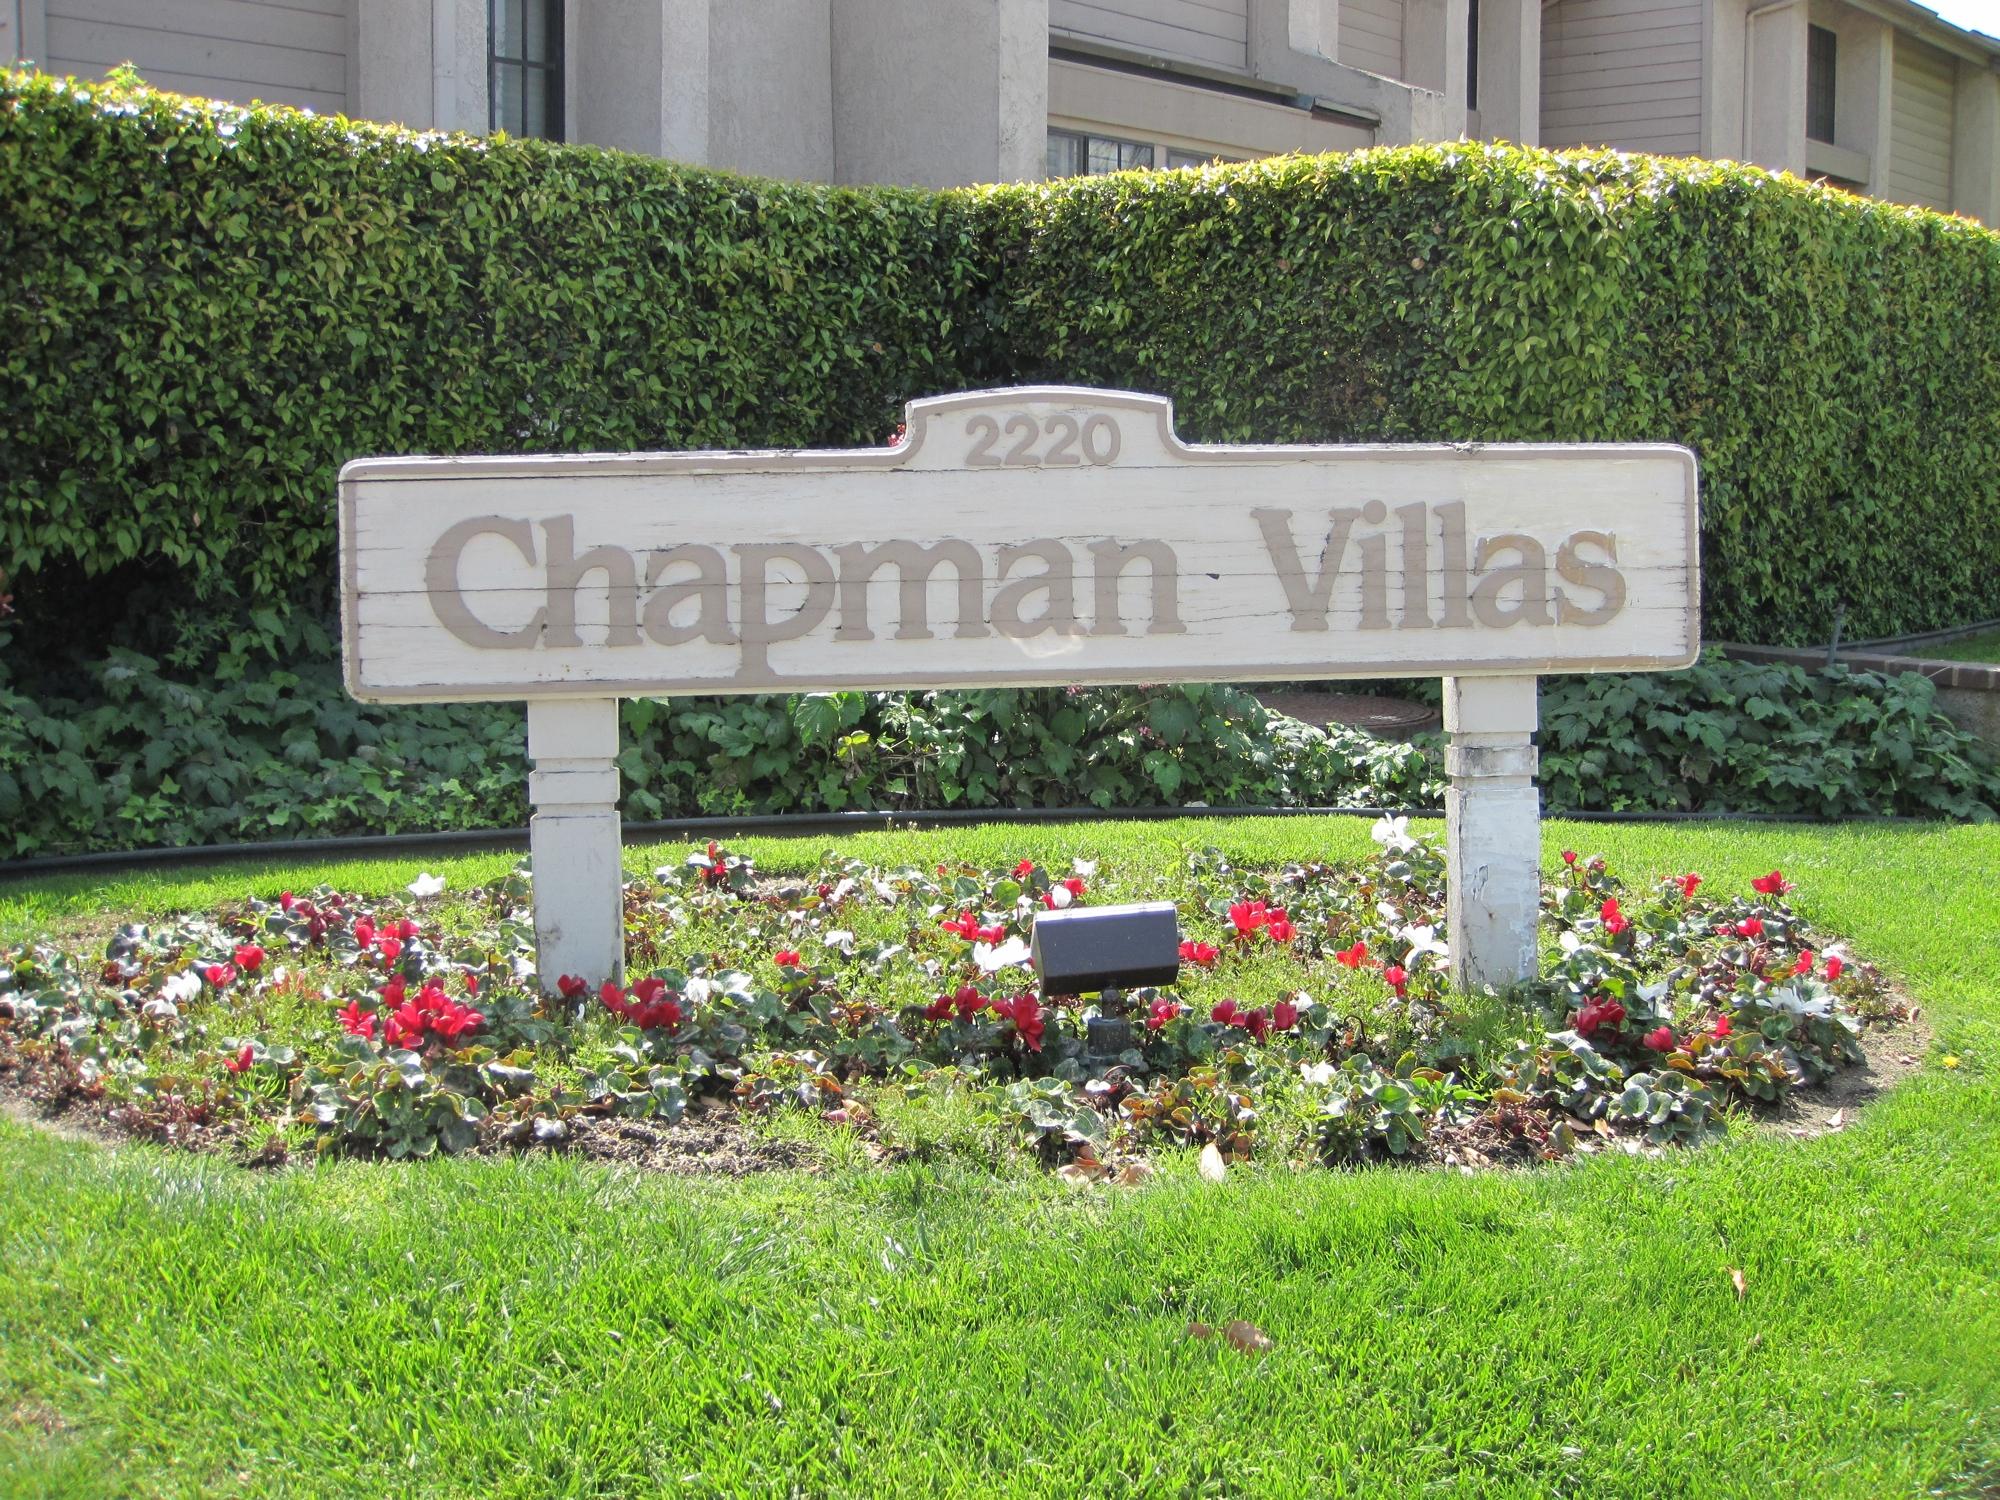 Chapman villas homes for sale fullerton real estate for Chapman laundry